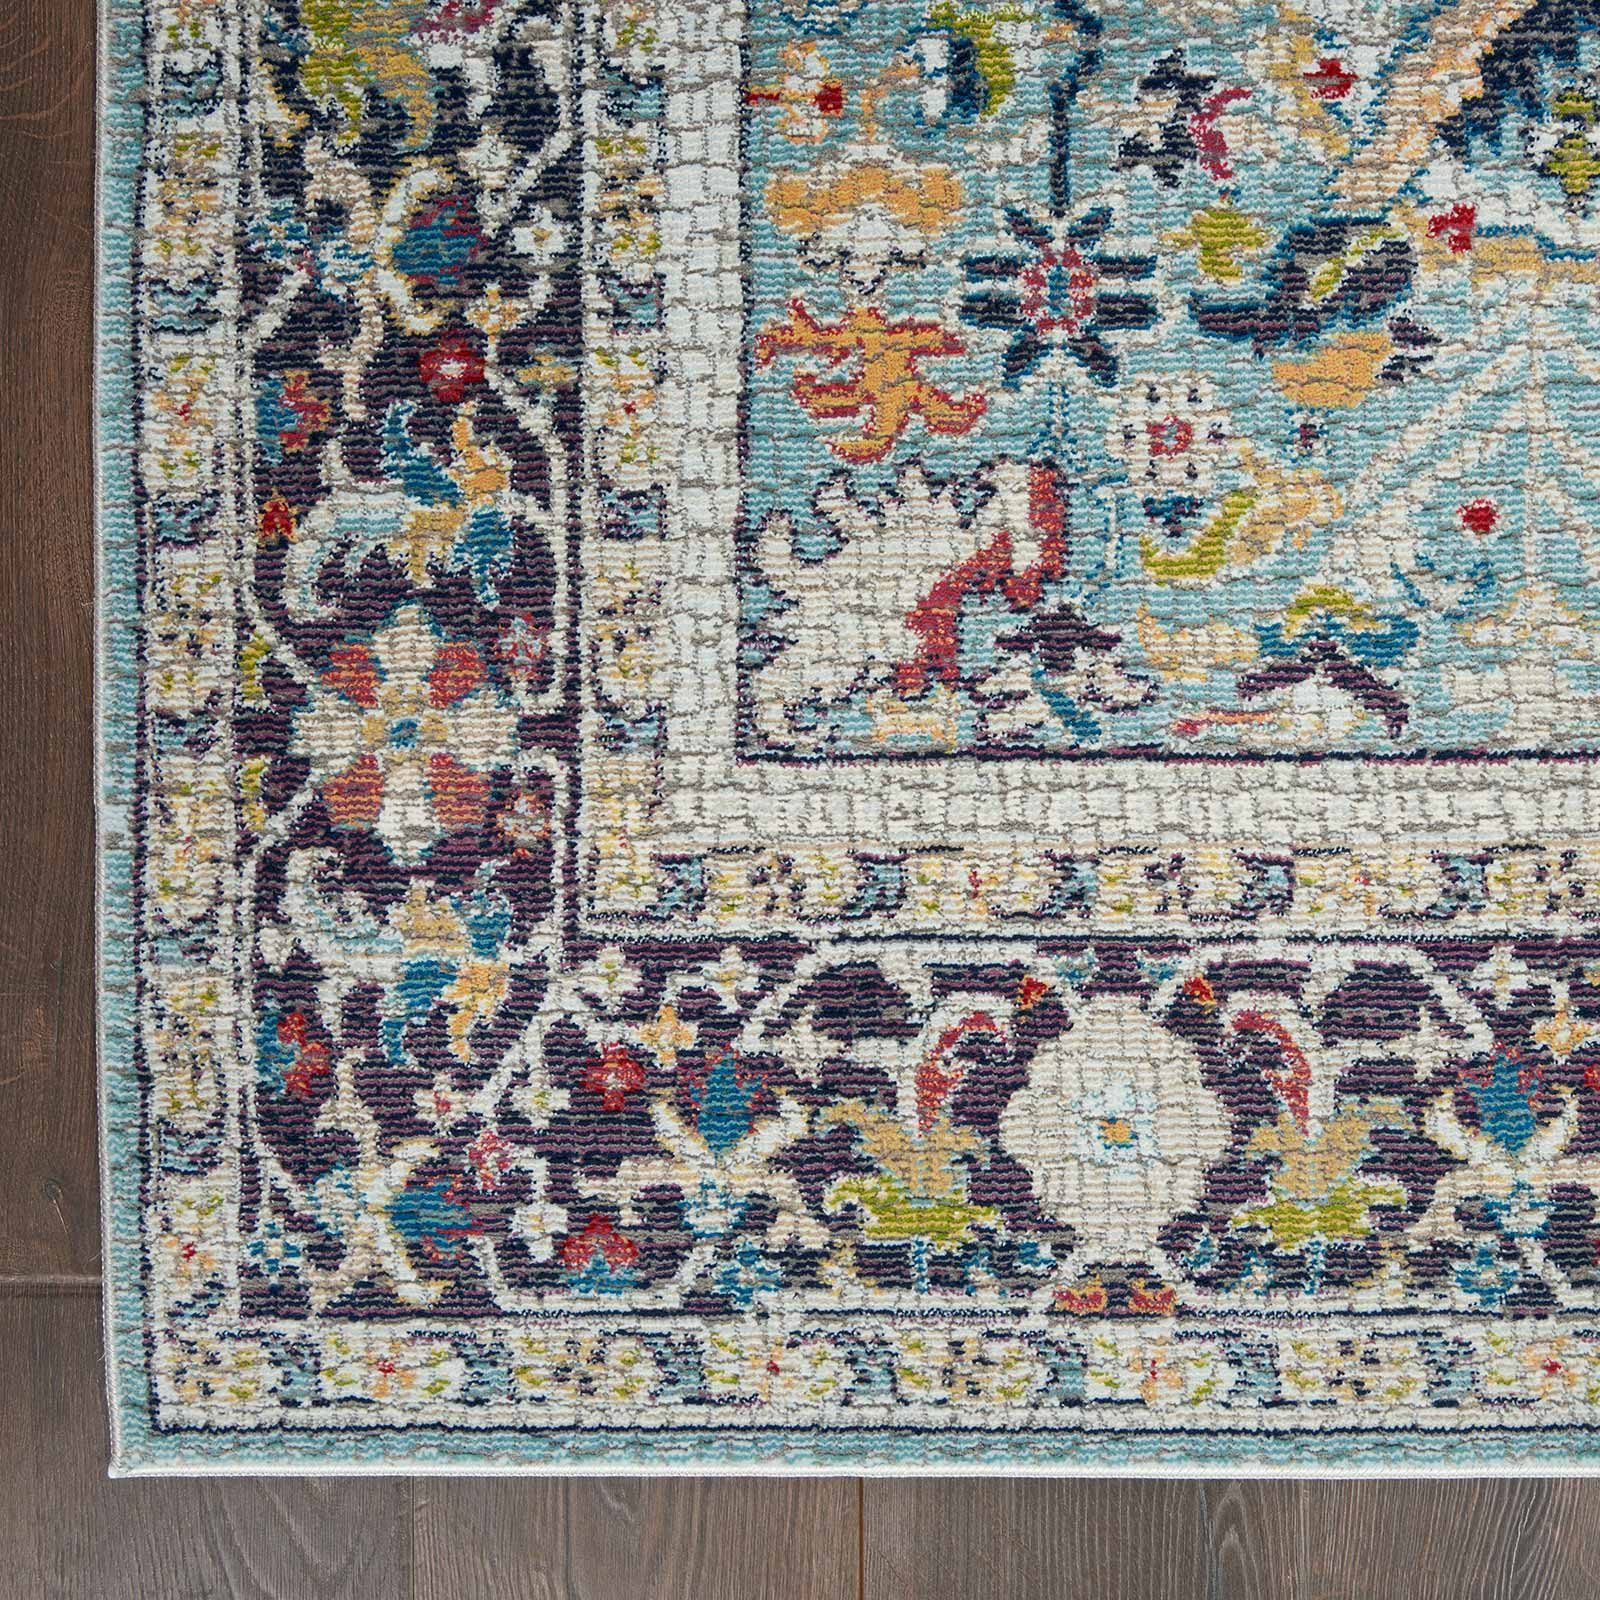 Nourison rug Ankara Global ANR14 TEAL MULTI 5x8 099446498441 CR C